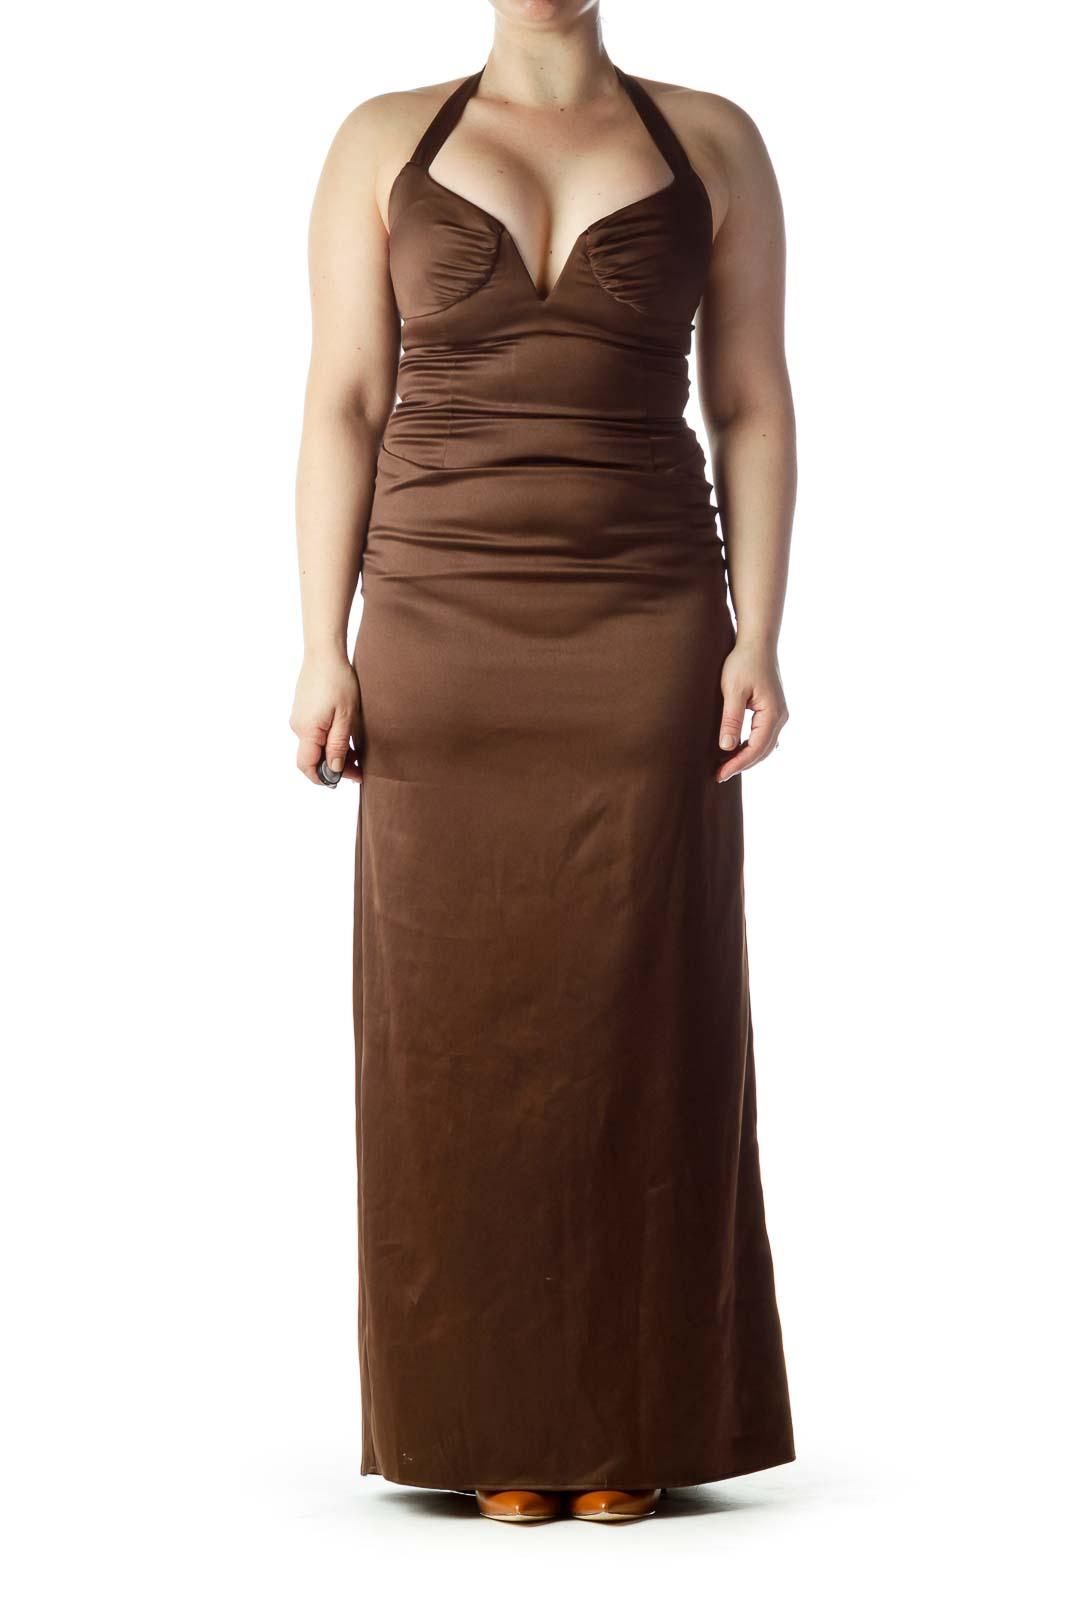 Brown Sweetheart Neck Halter Evening Dress